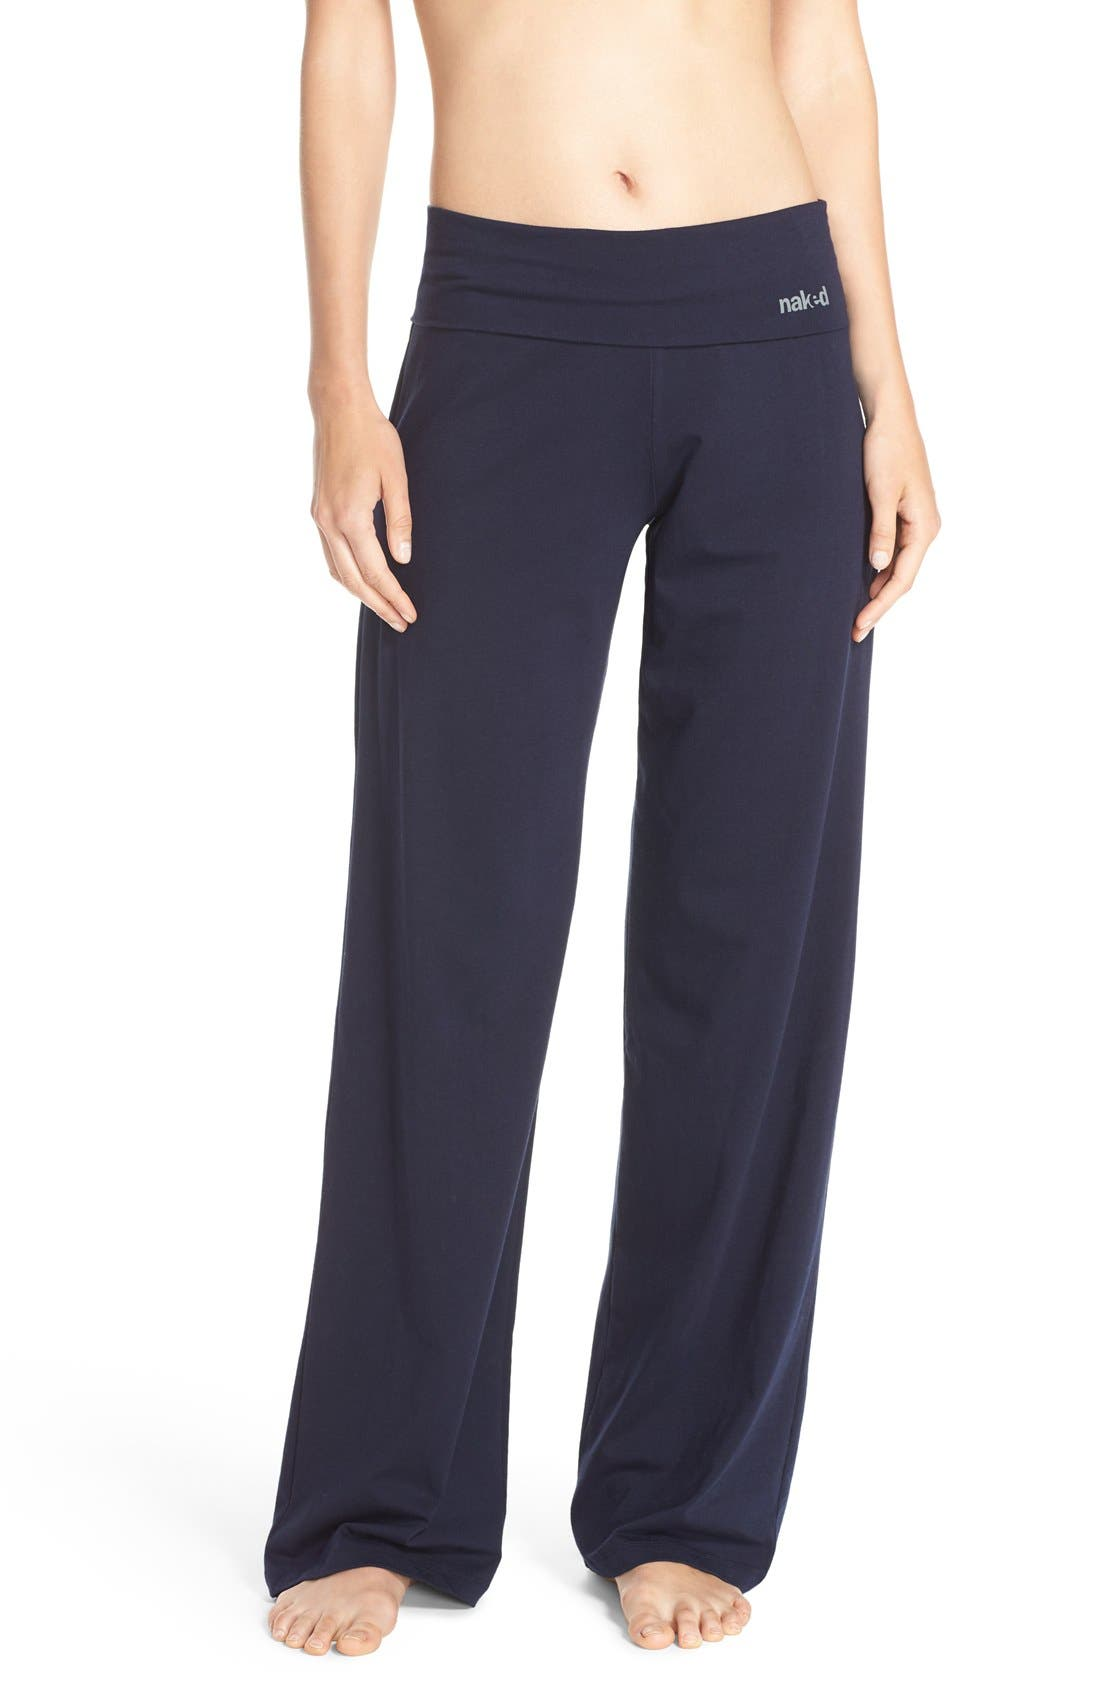 Main Image - Naked Wide Leg Stretch Cotton Pajama Pants